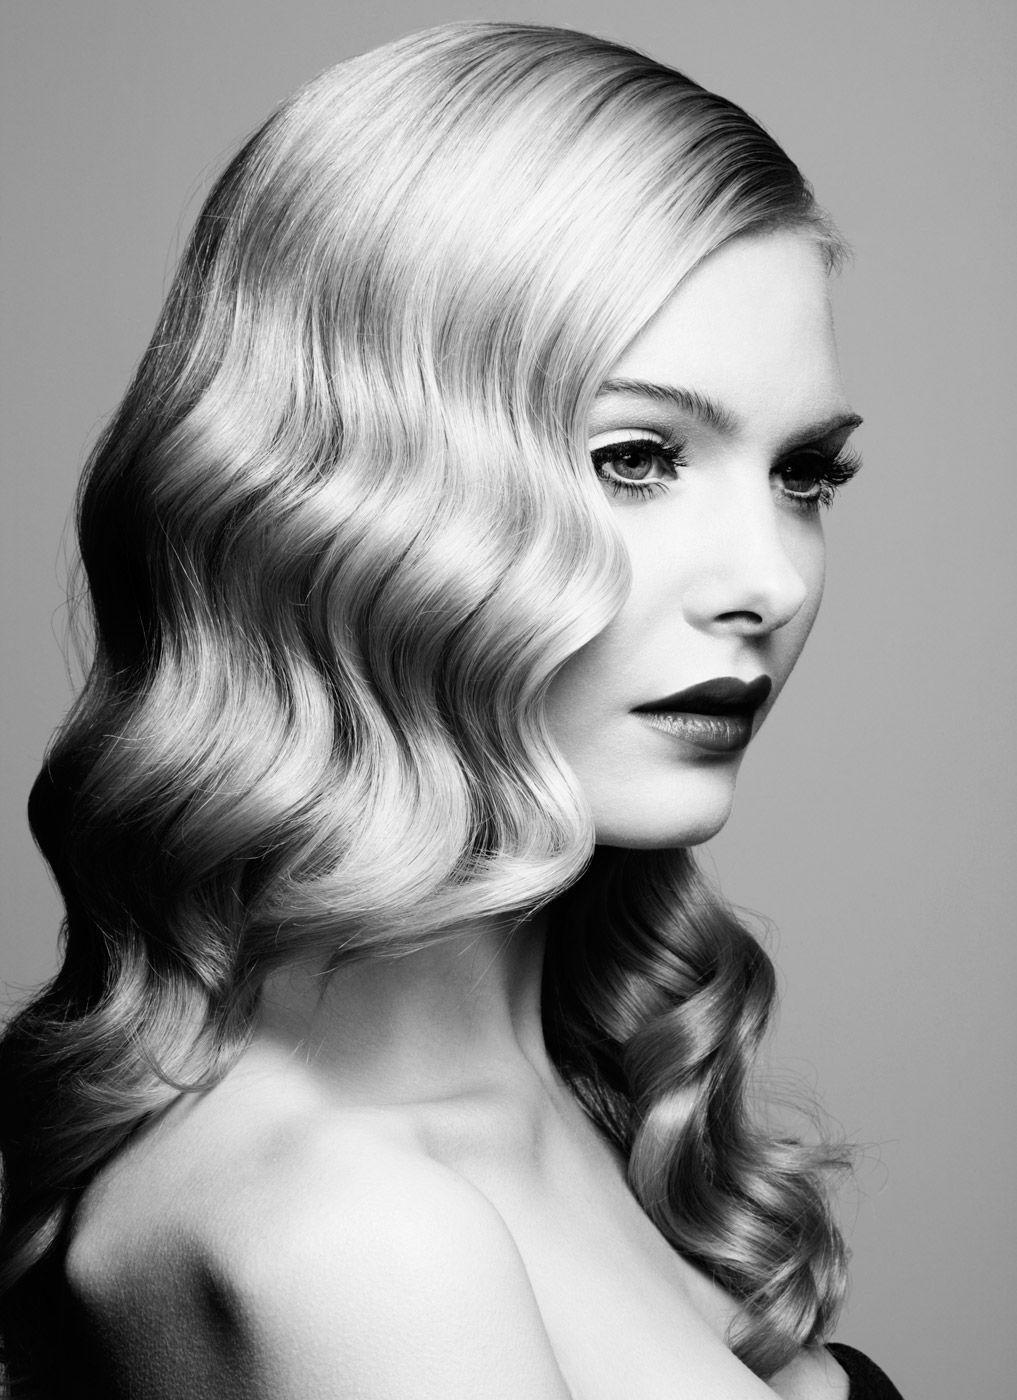 20 Stylish Retro Wavy Hairstyle Tutorials And Hair Looks Hair